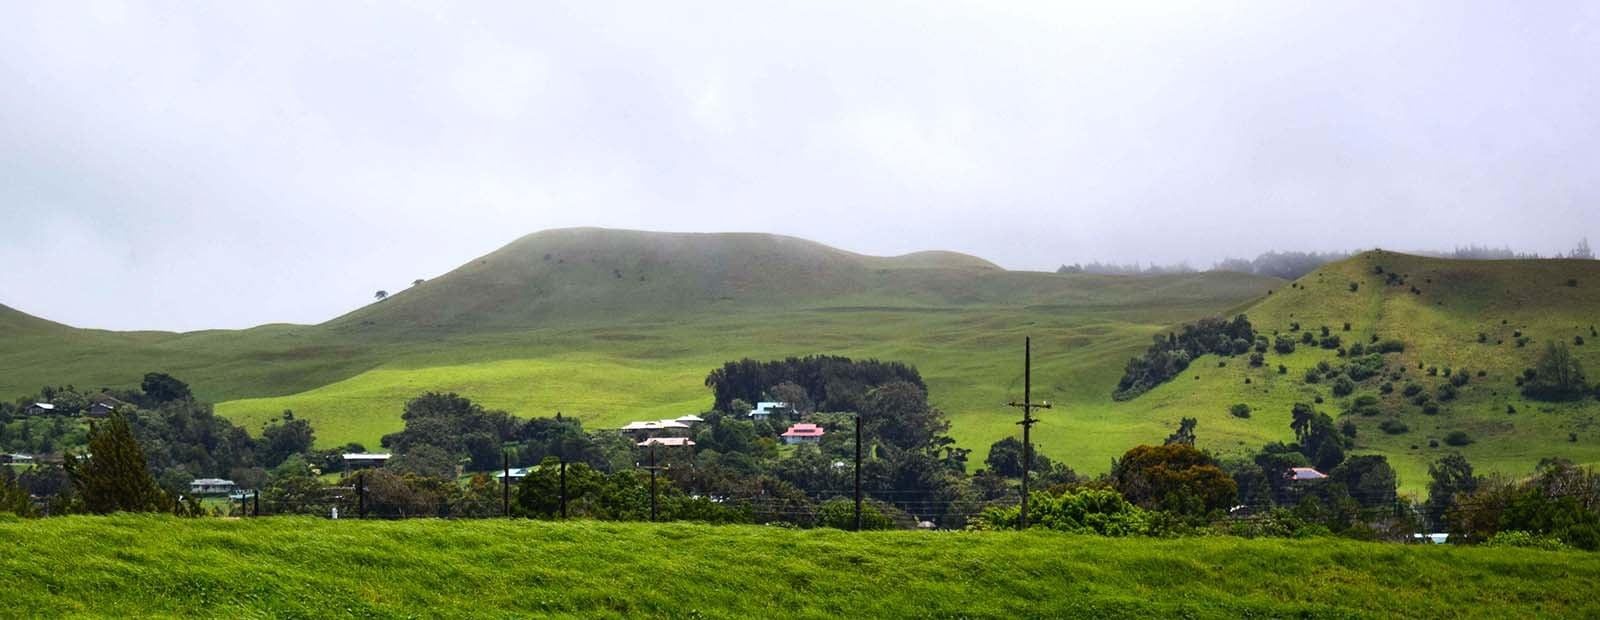 waimea-big-island-green-hills-1